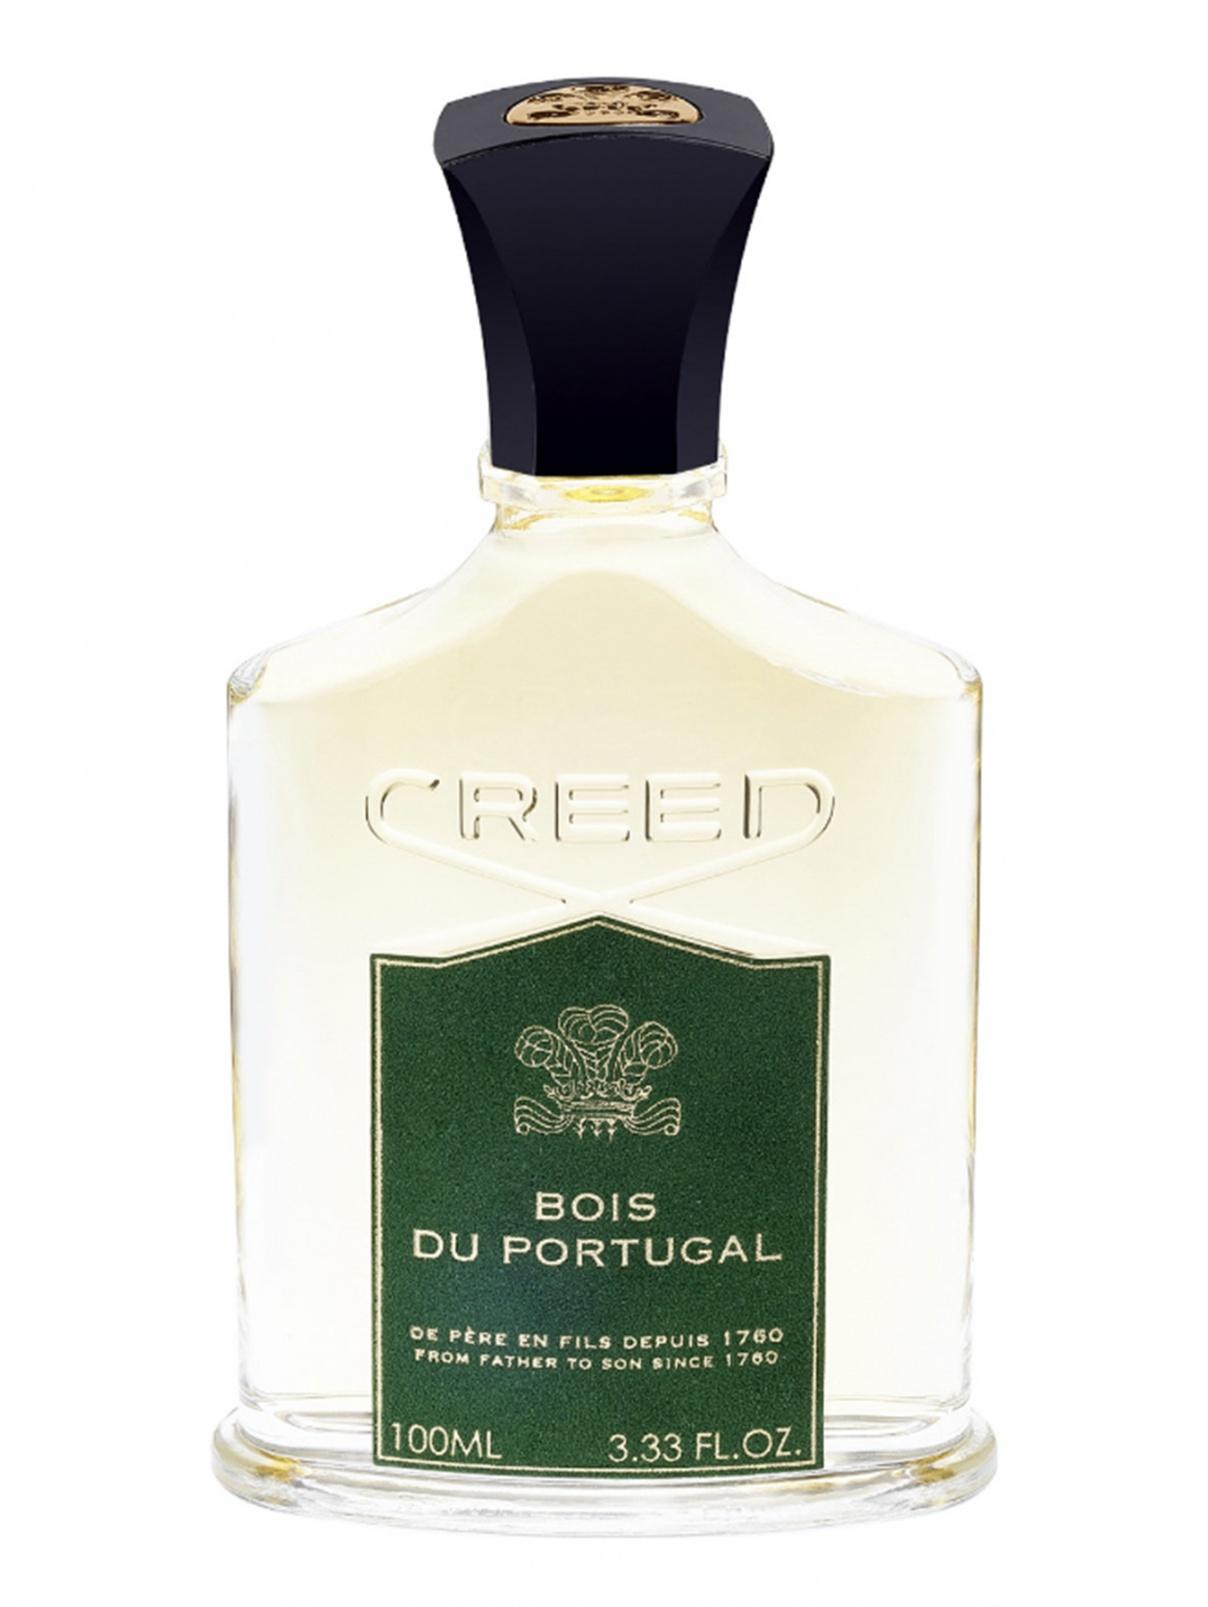 Парфюмерная вода 100 мл Bois Du Portugal Creed  –  Общий вид